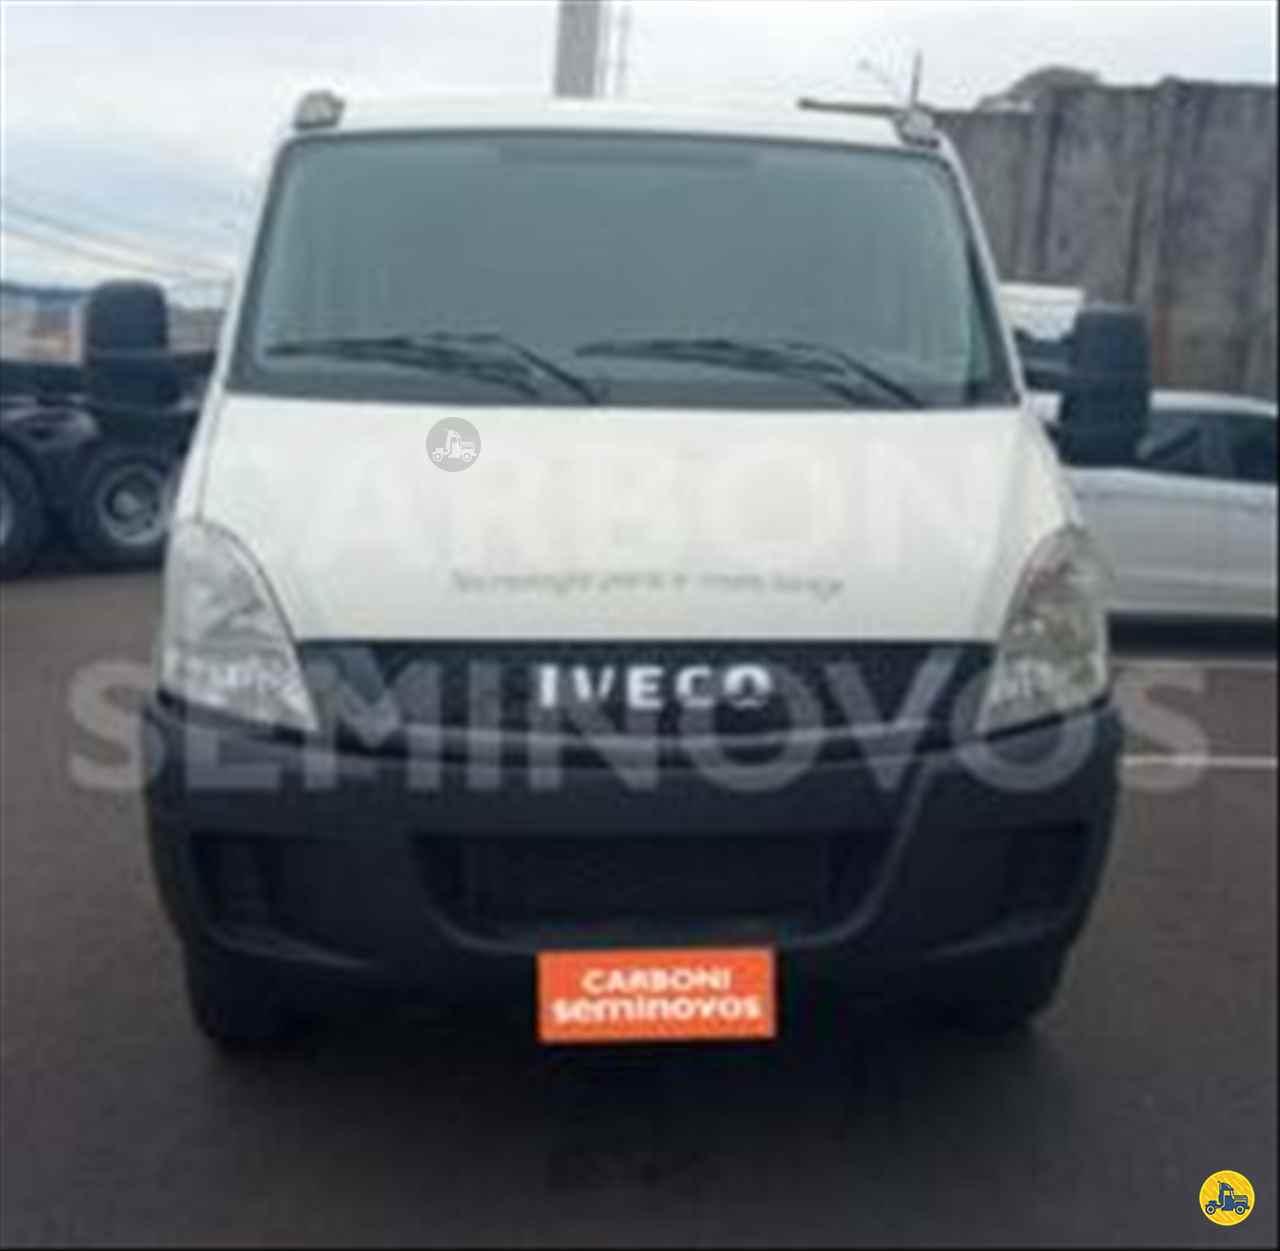 CAMINHAO IVECO DAILY 55c17 Chassis 3/4 4x2 Carboni Iveco VIDEIRA SANTA CATARINA SC